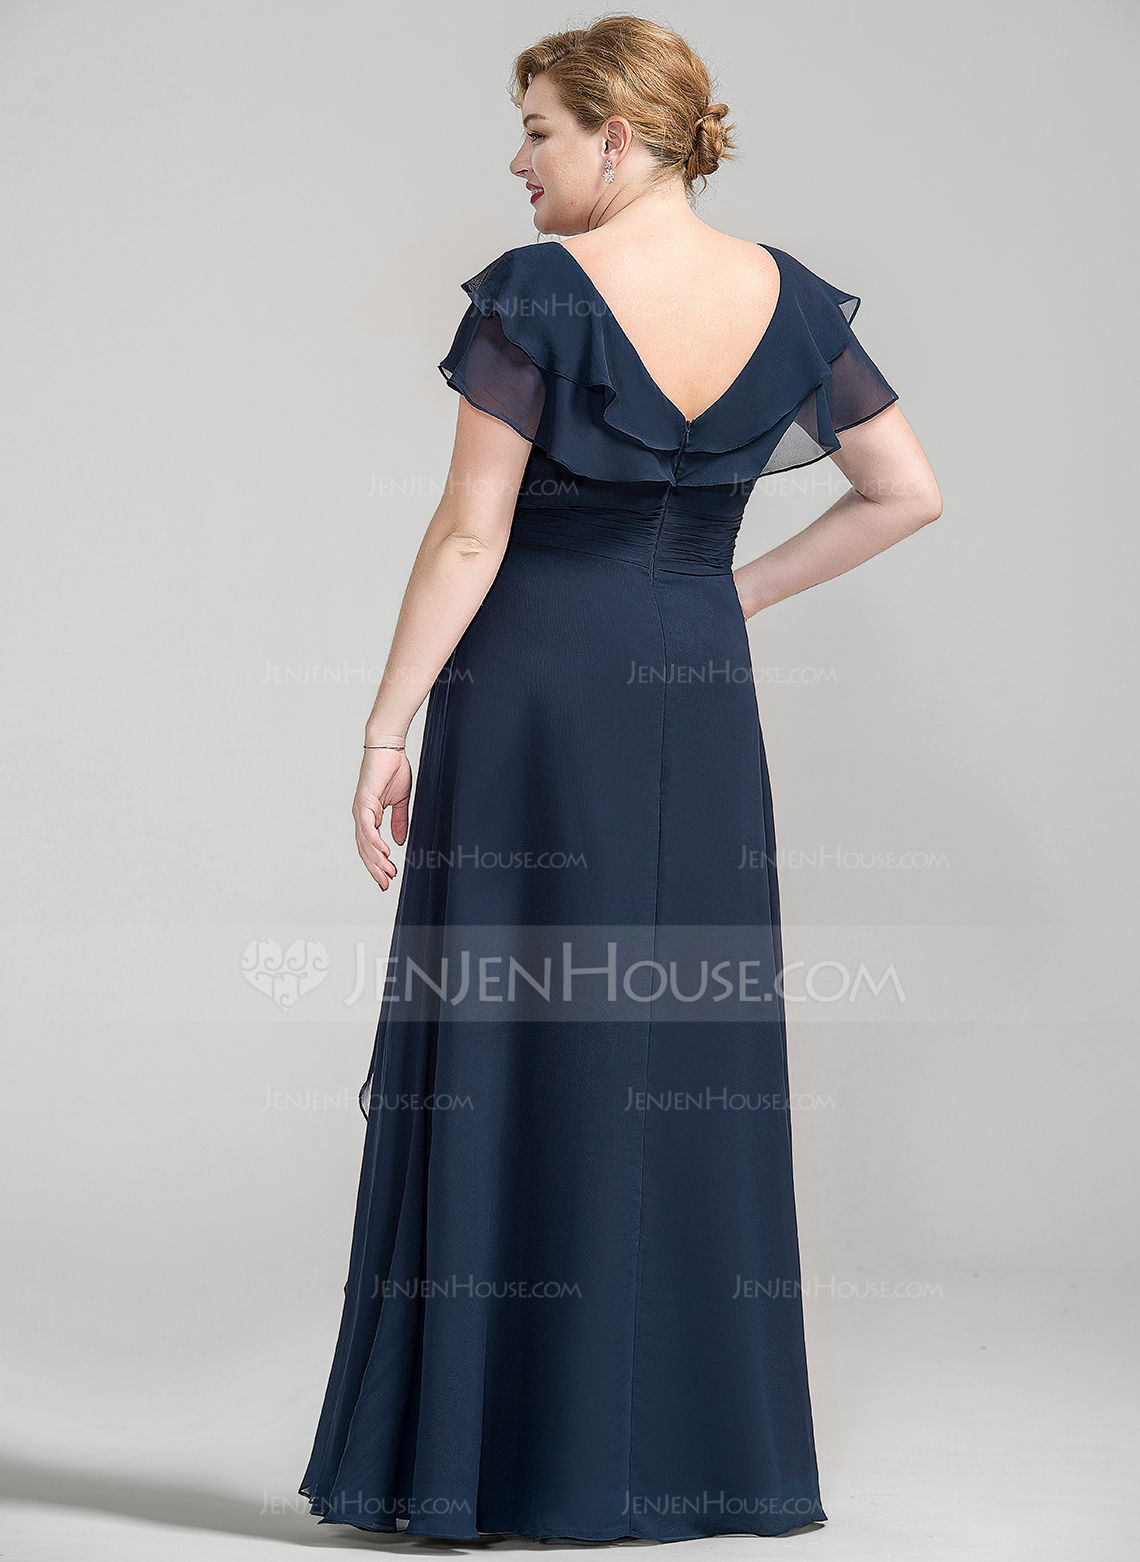 6b6b34a717c A-Line Princess V-neck Floor-Length Chiffon Mother of the Bride Dress With  Crystal Brooch Cascading Ruffles (008077027) - JenJenHouse